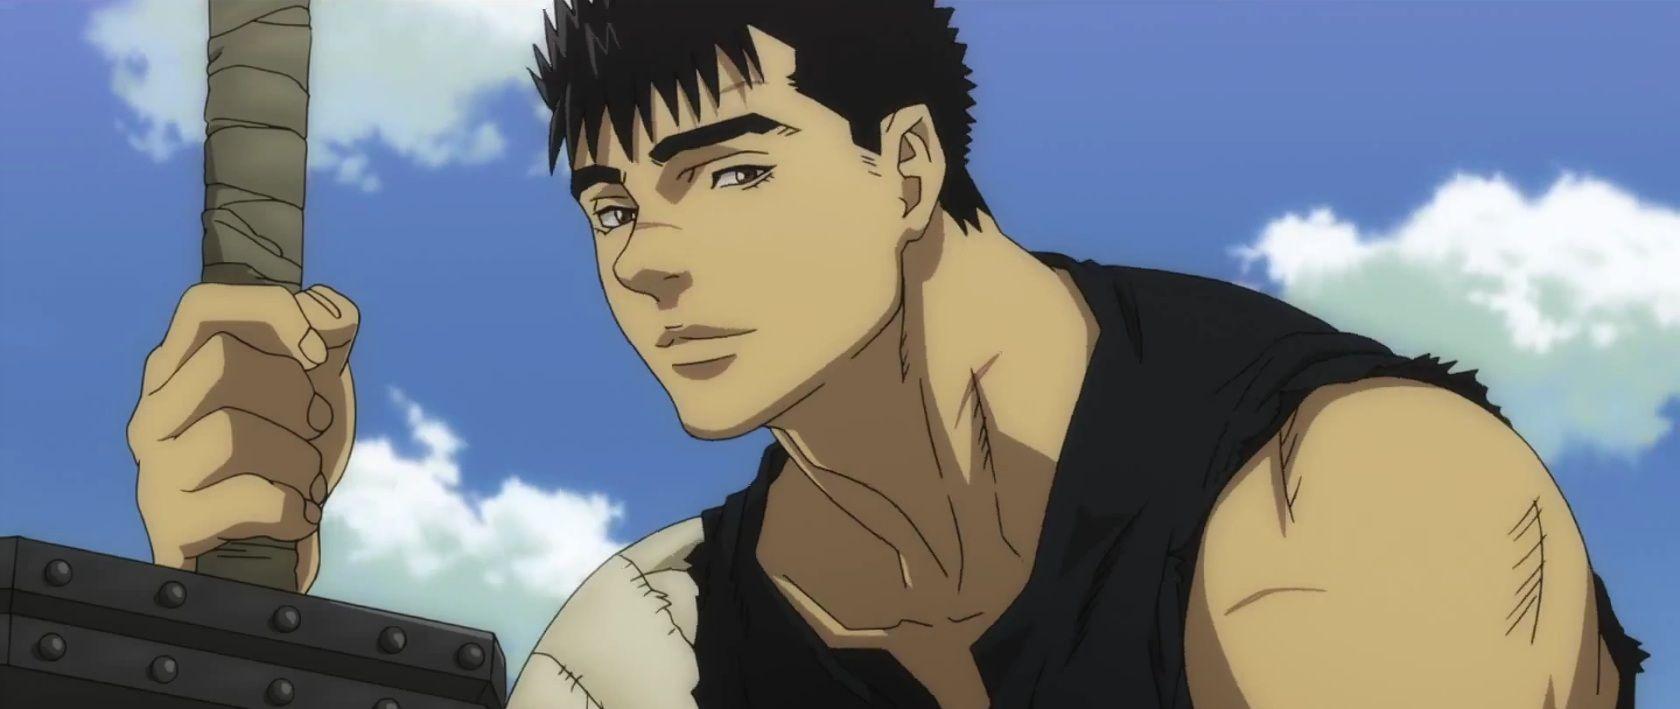 Anime Characters Like Guts : Berserk guts movie google search tc pinterest